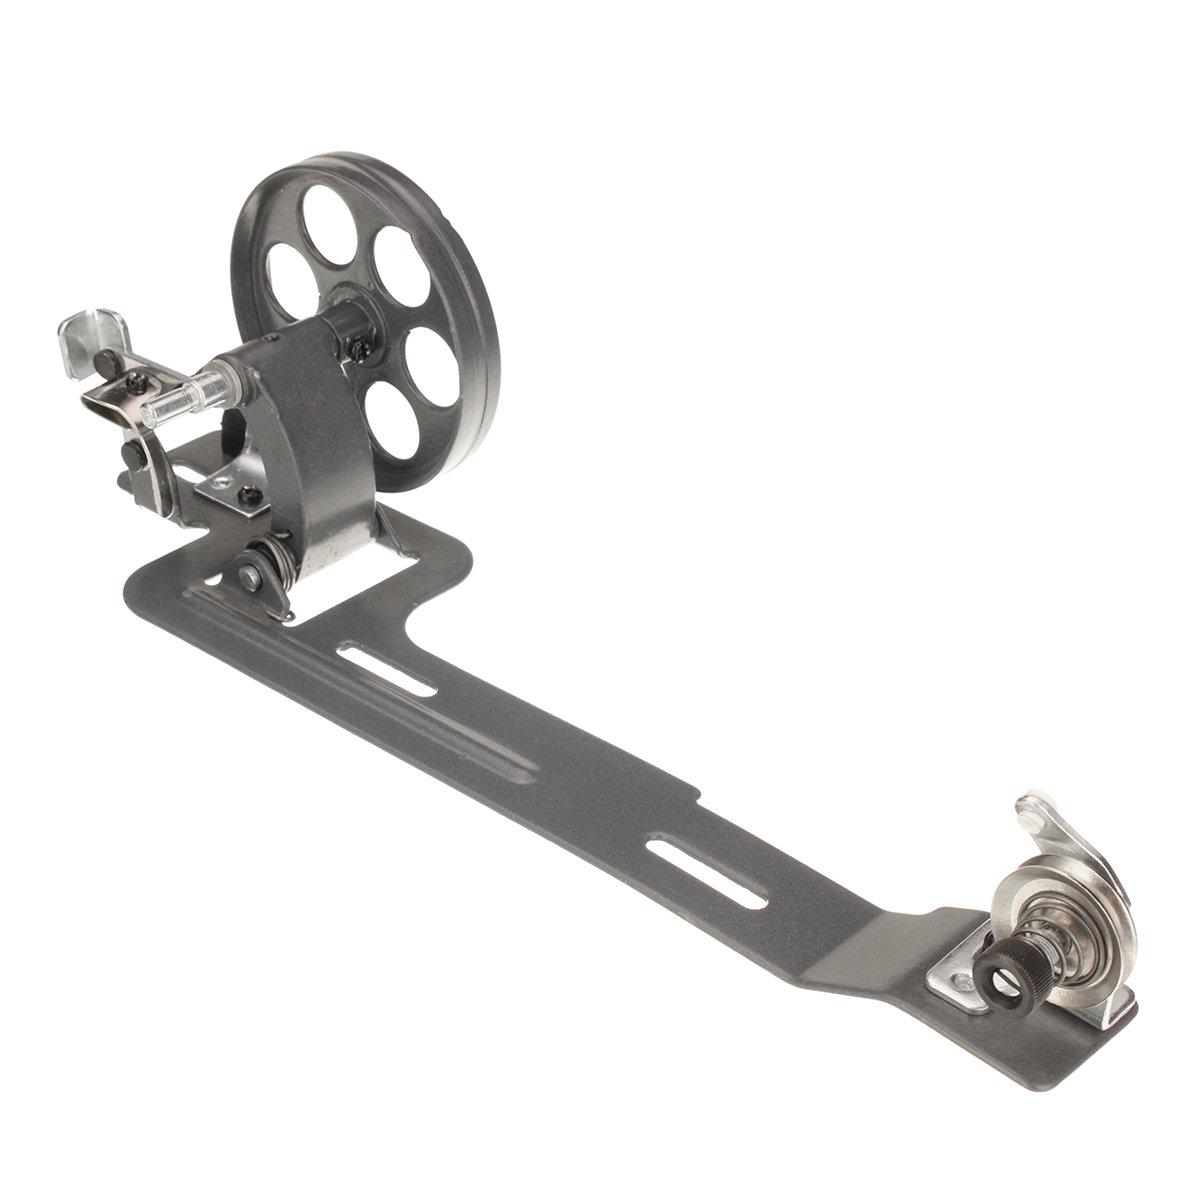 Black Industrial Sewing Machine Bobbin Winder 3